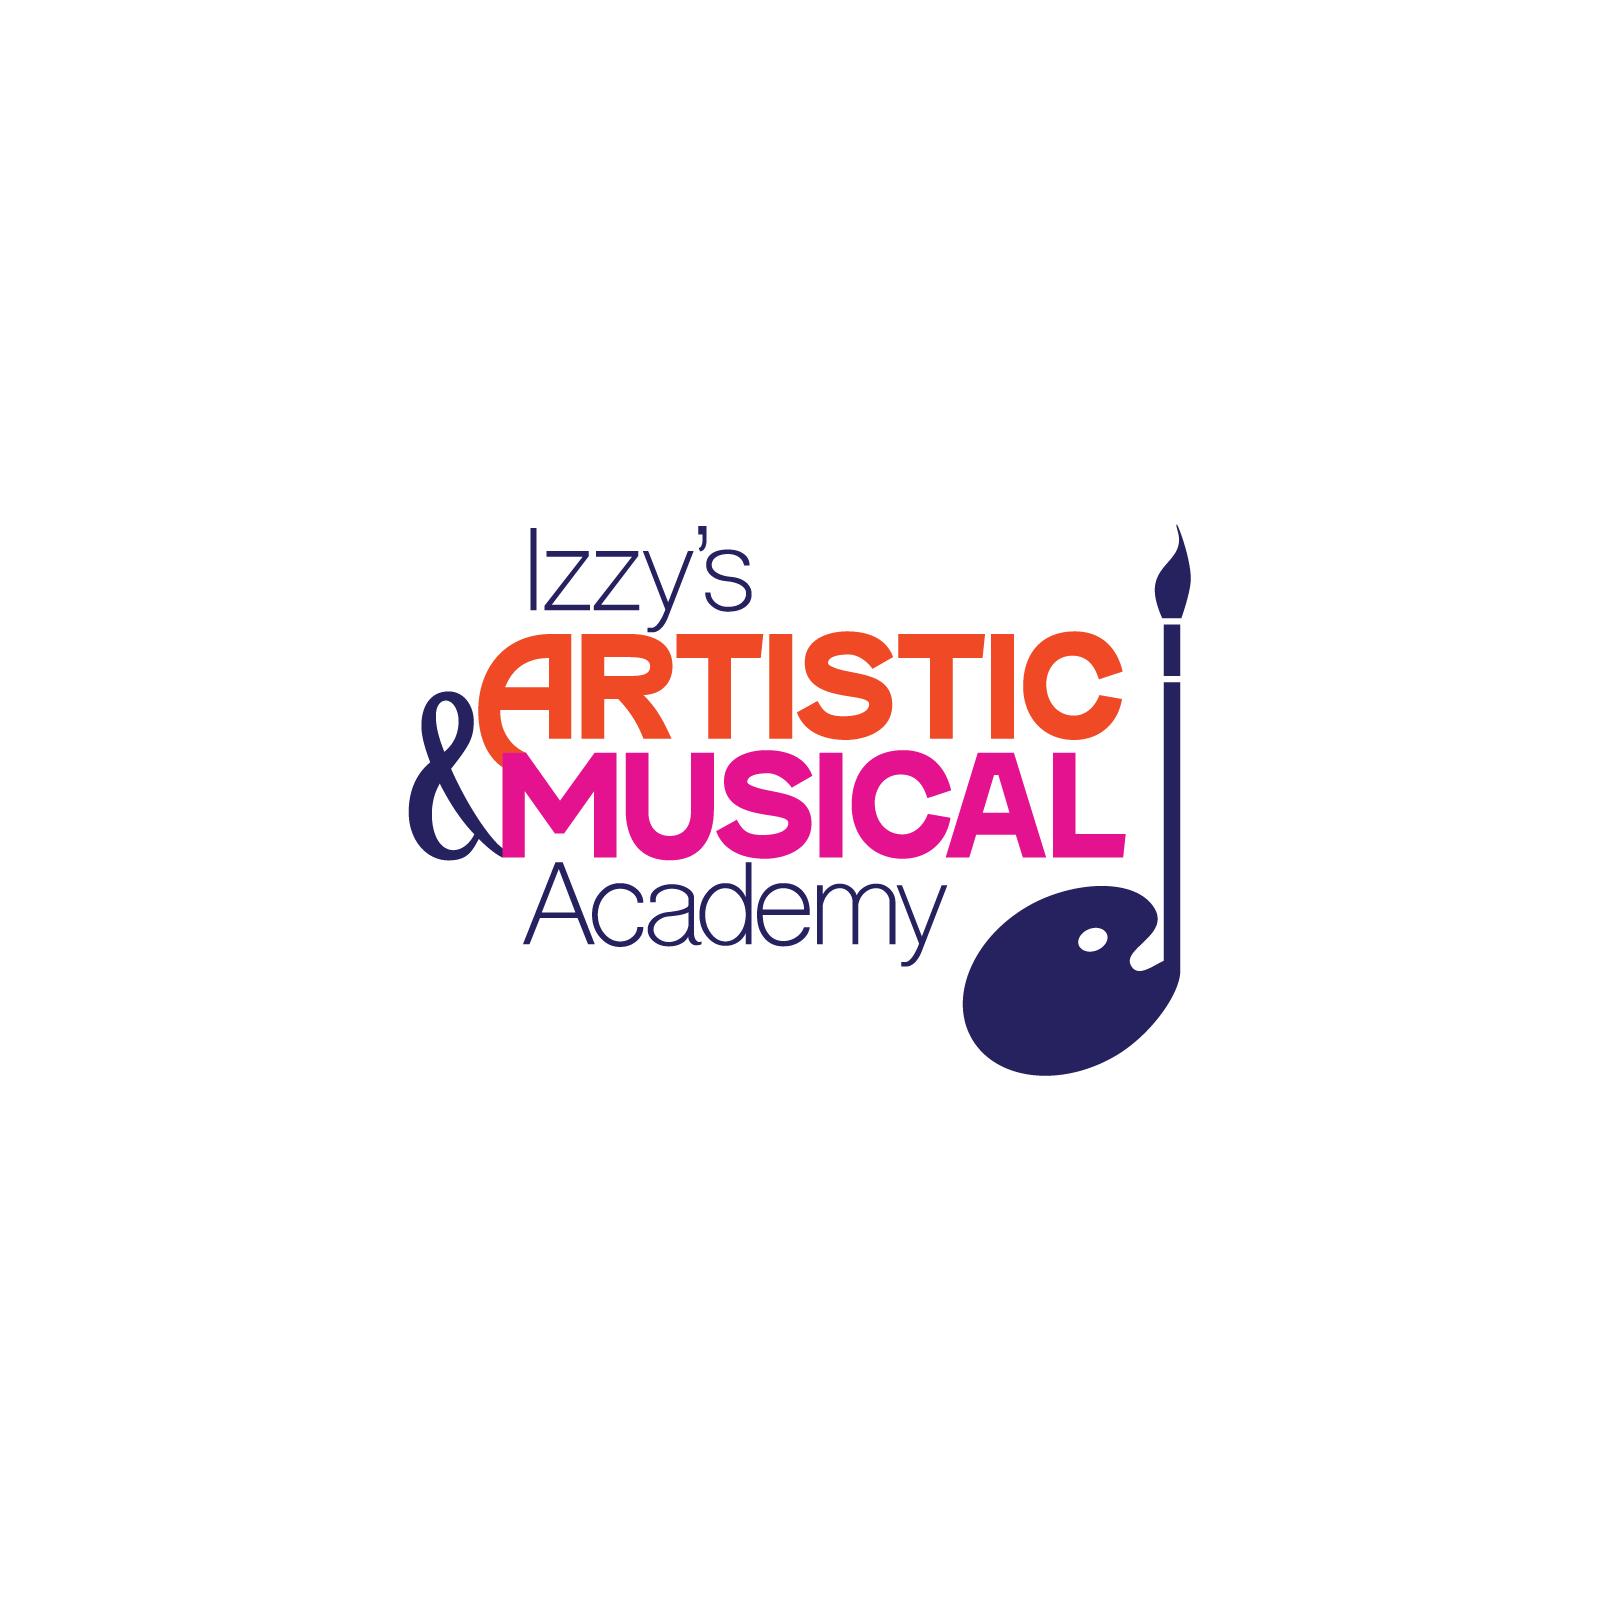 Izzy's Artistic & Musical Academy : Logo